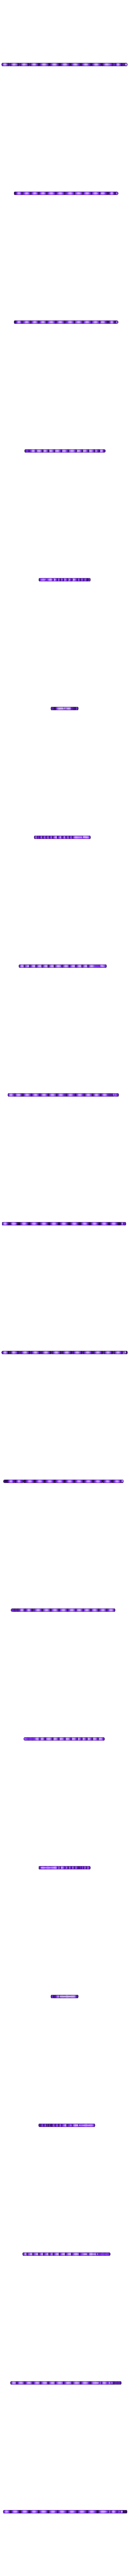 Female-braid-hair-03-low.stl Download STL file hair braid hair styling roller hair accessories for girl headdress female weaving tool fbh-03 3d print cnc • 3D printing object, Dzusto